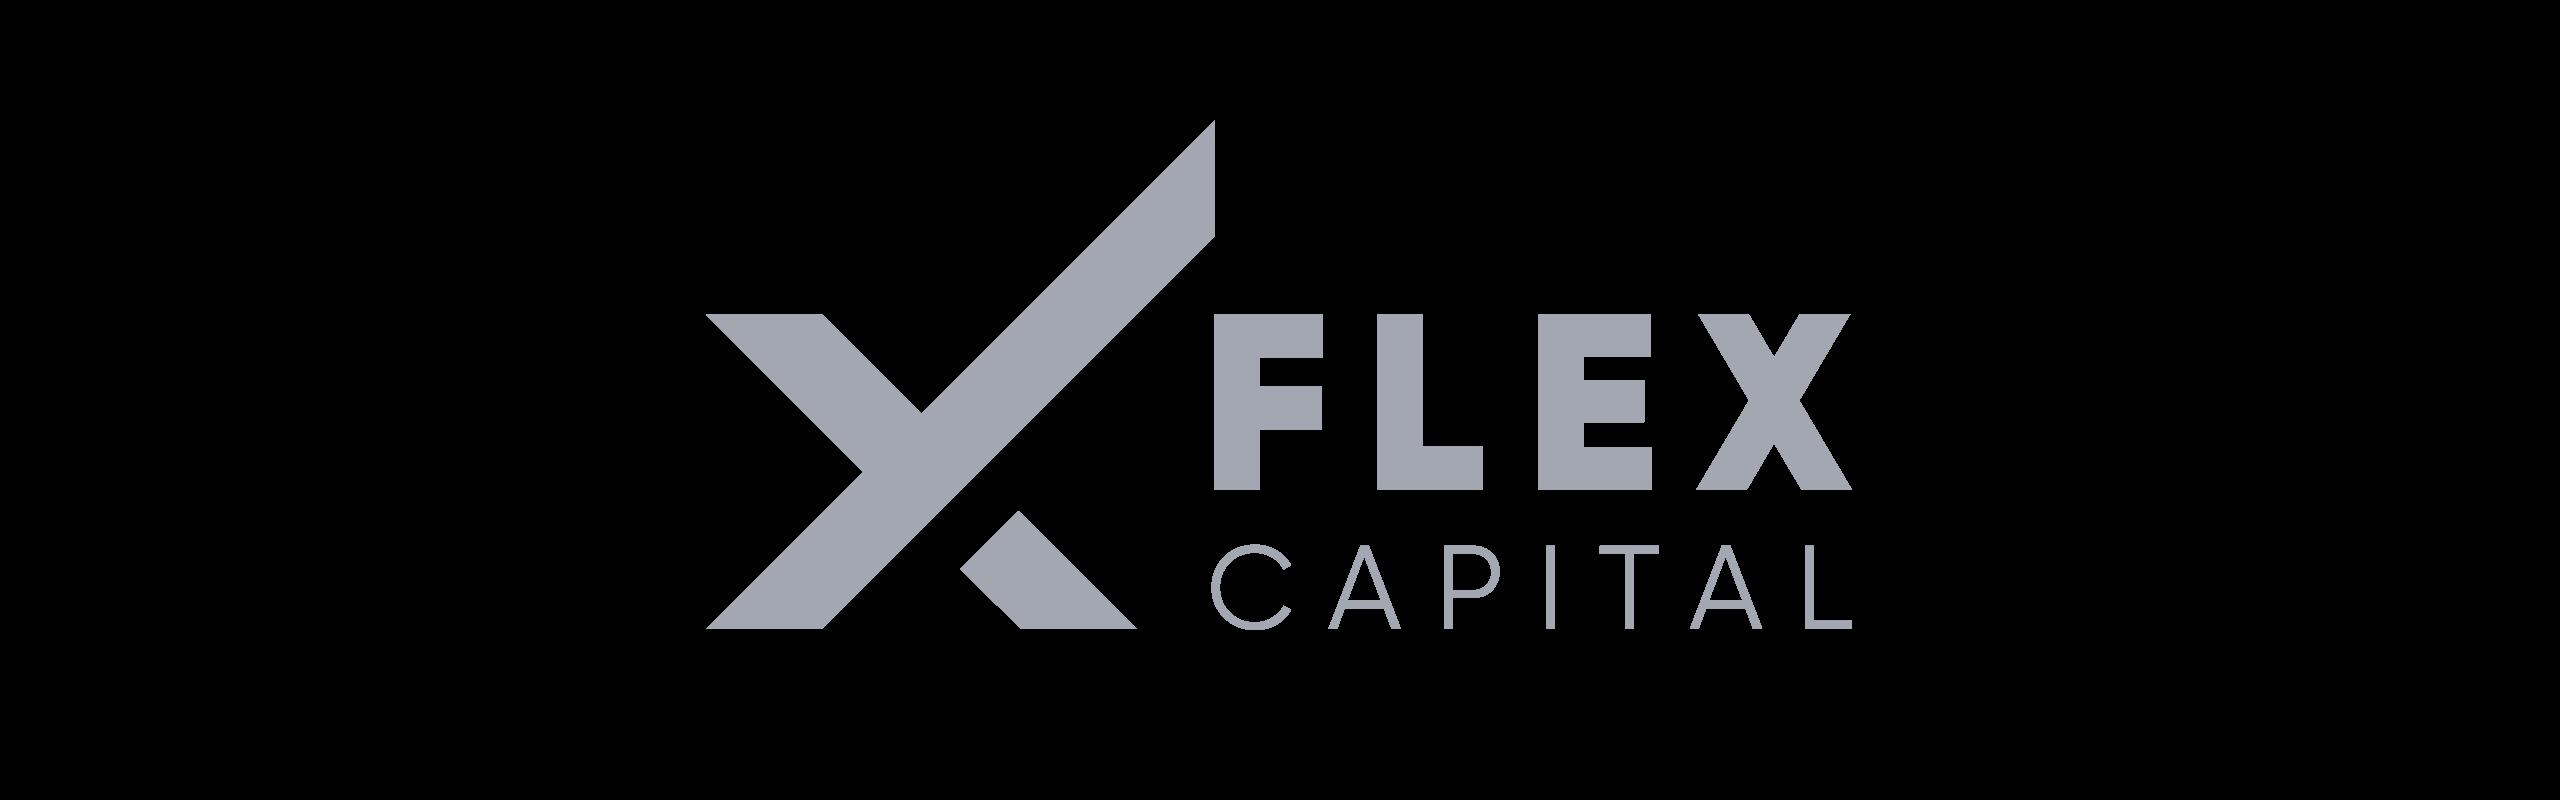 Technology & product due diligence | Code & Co. advises FLEX CAPITAL (logo shown)